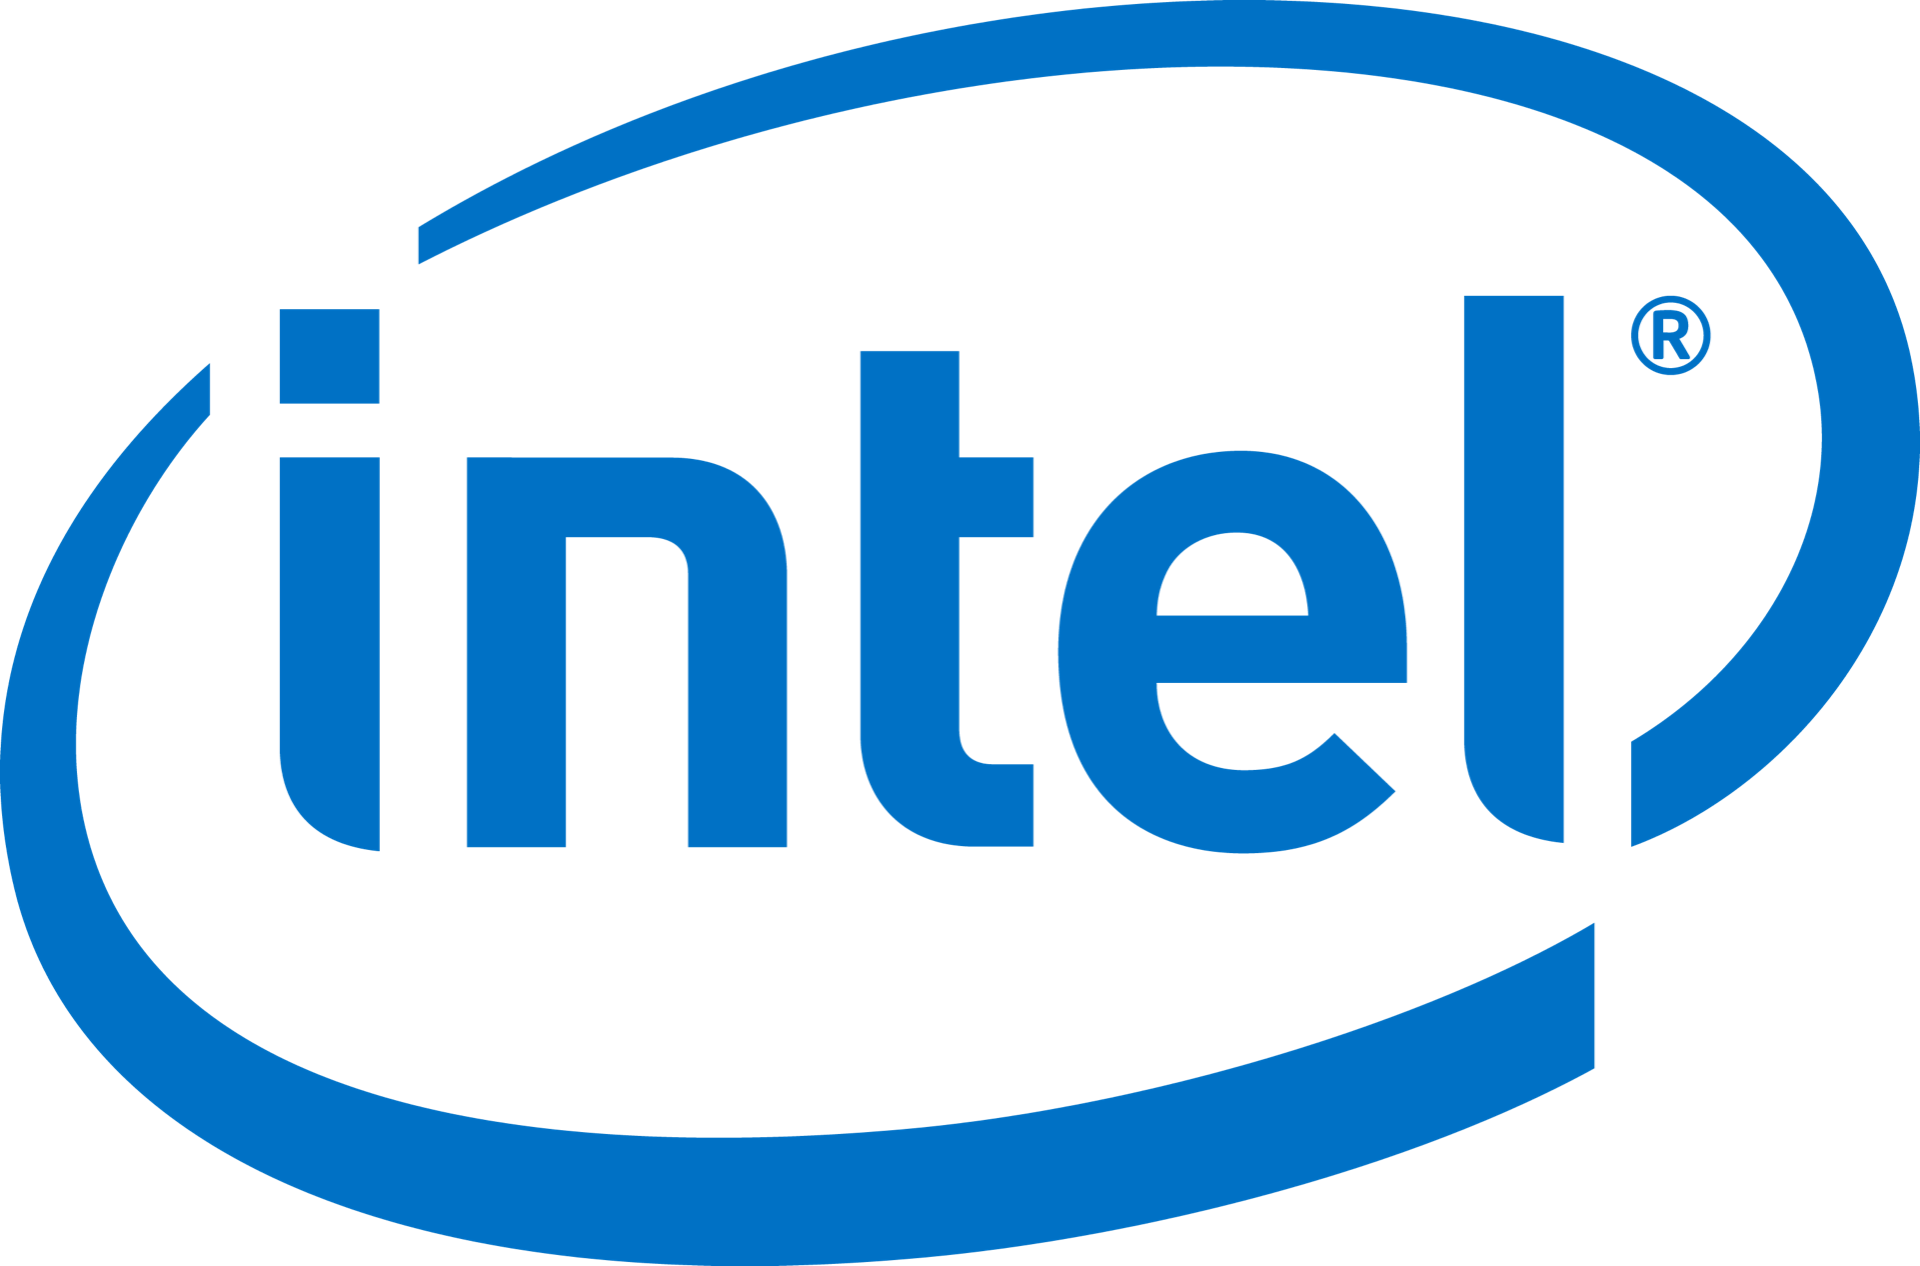 Go to Intel Corporation